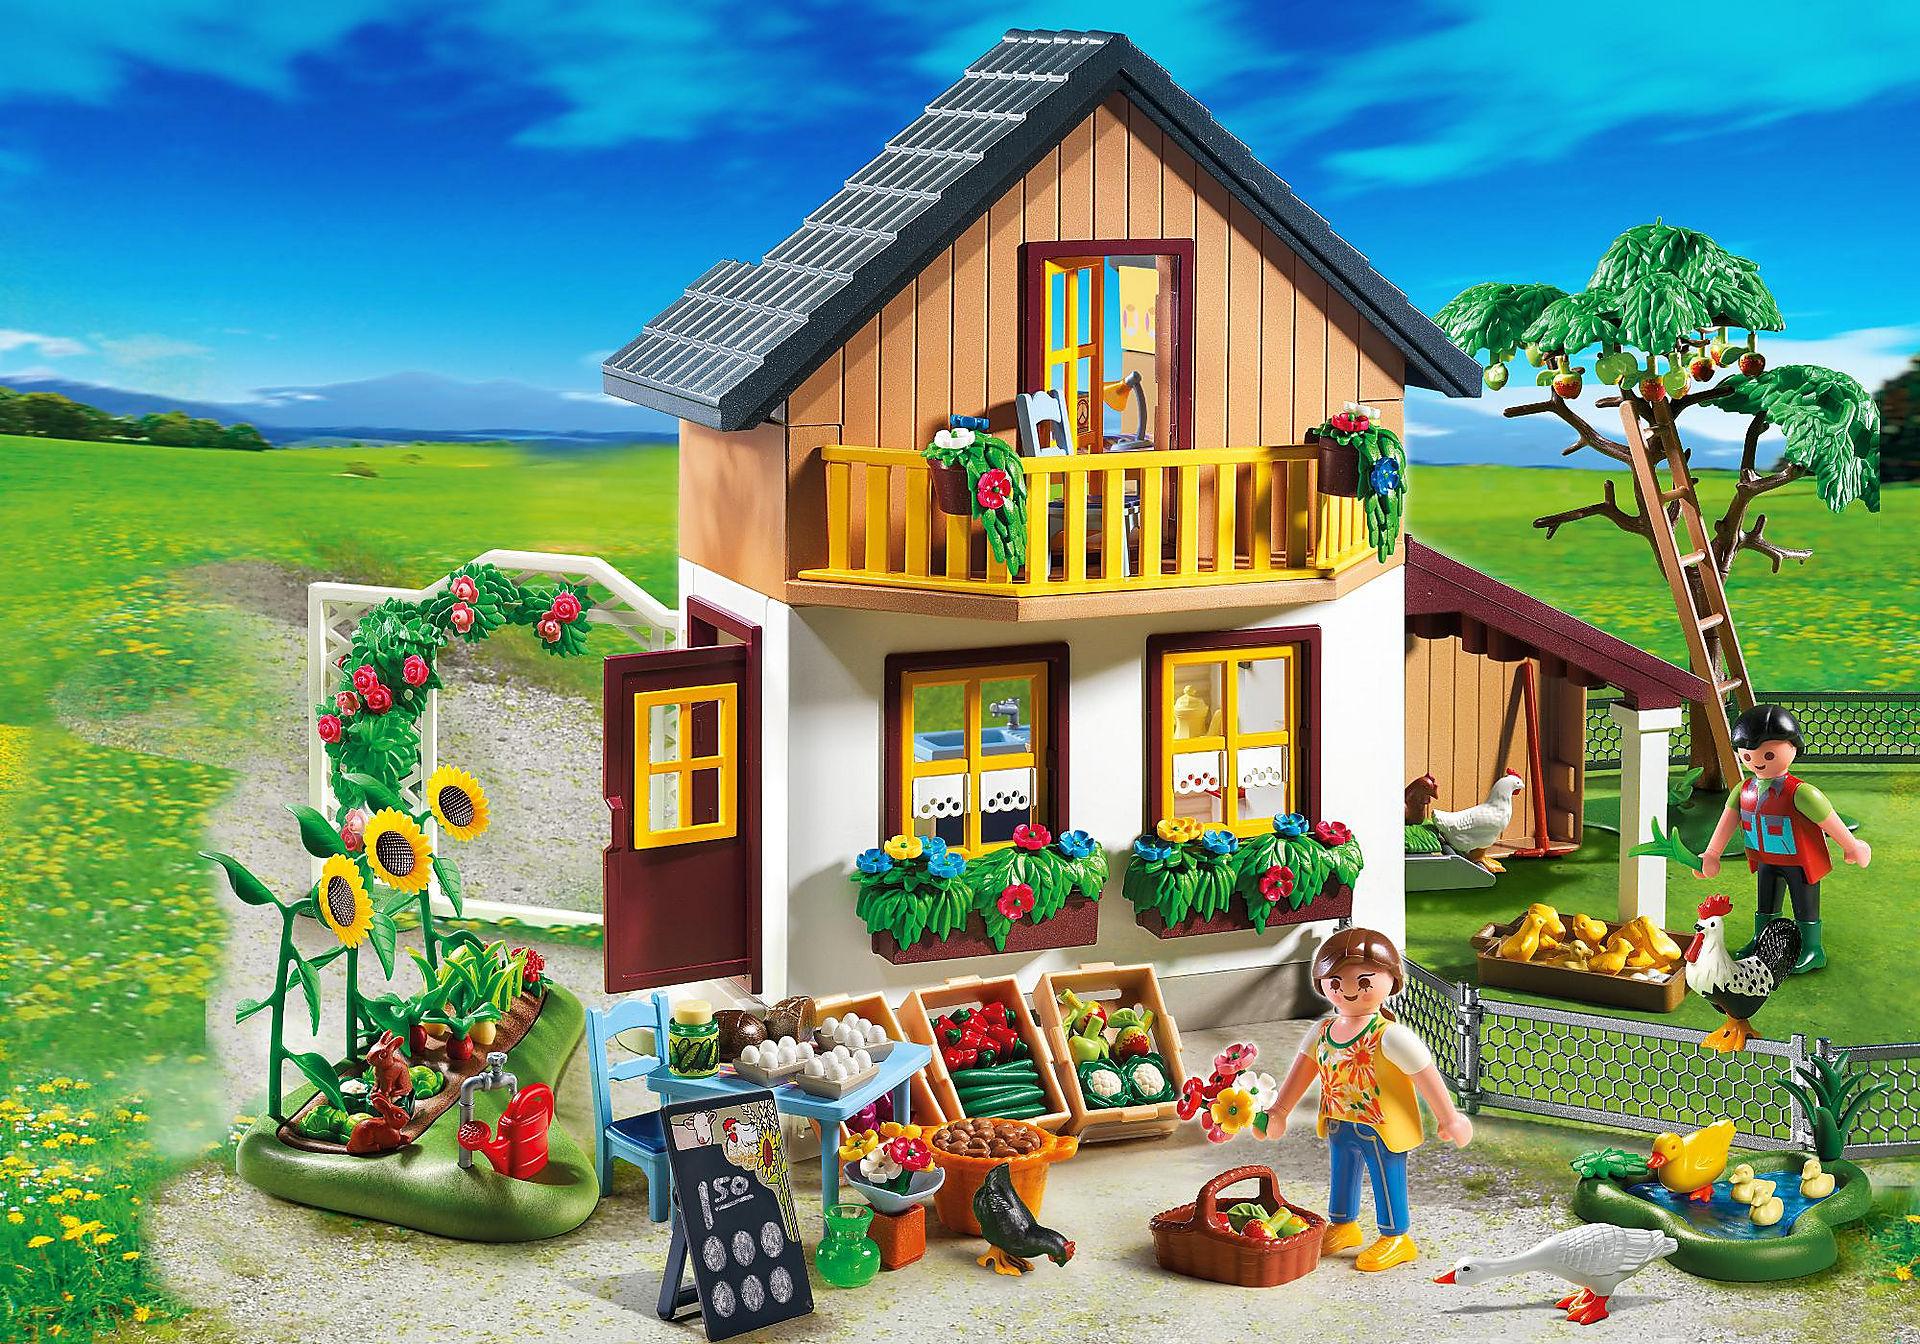 http://media.playmobil.com/i/playmobil/5120_product_extra1/Bauernhaus mit Hofladen